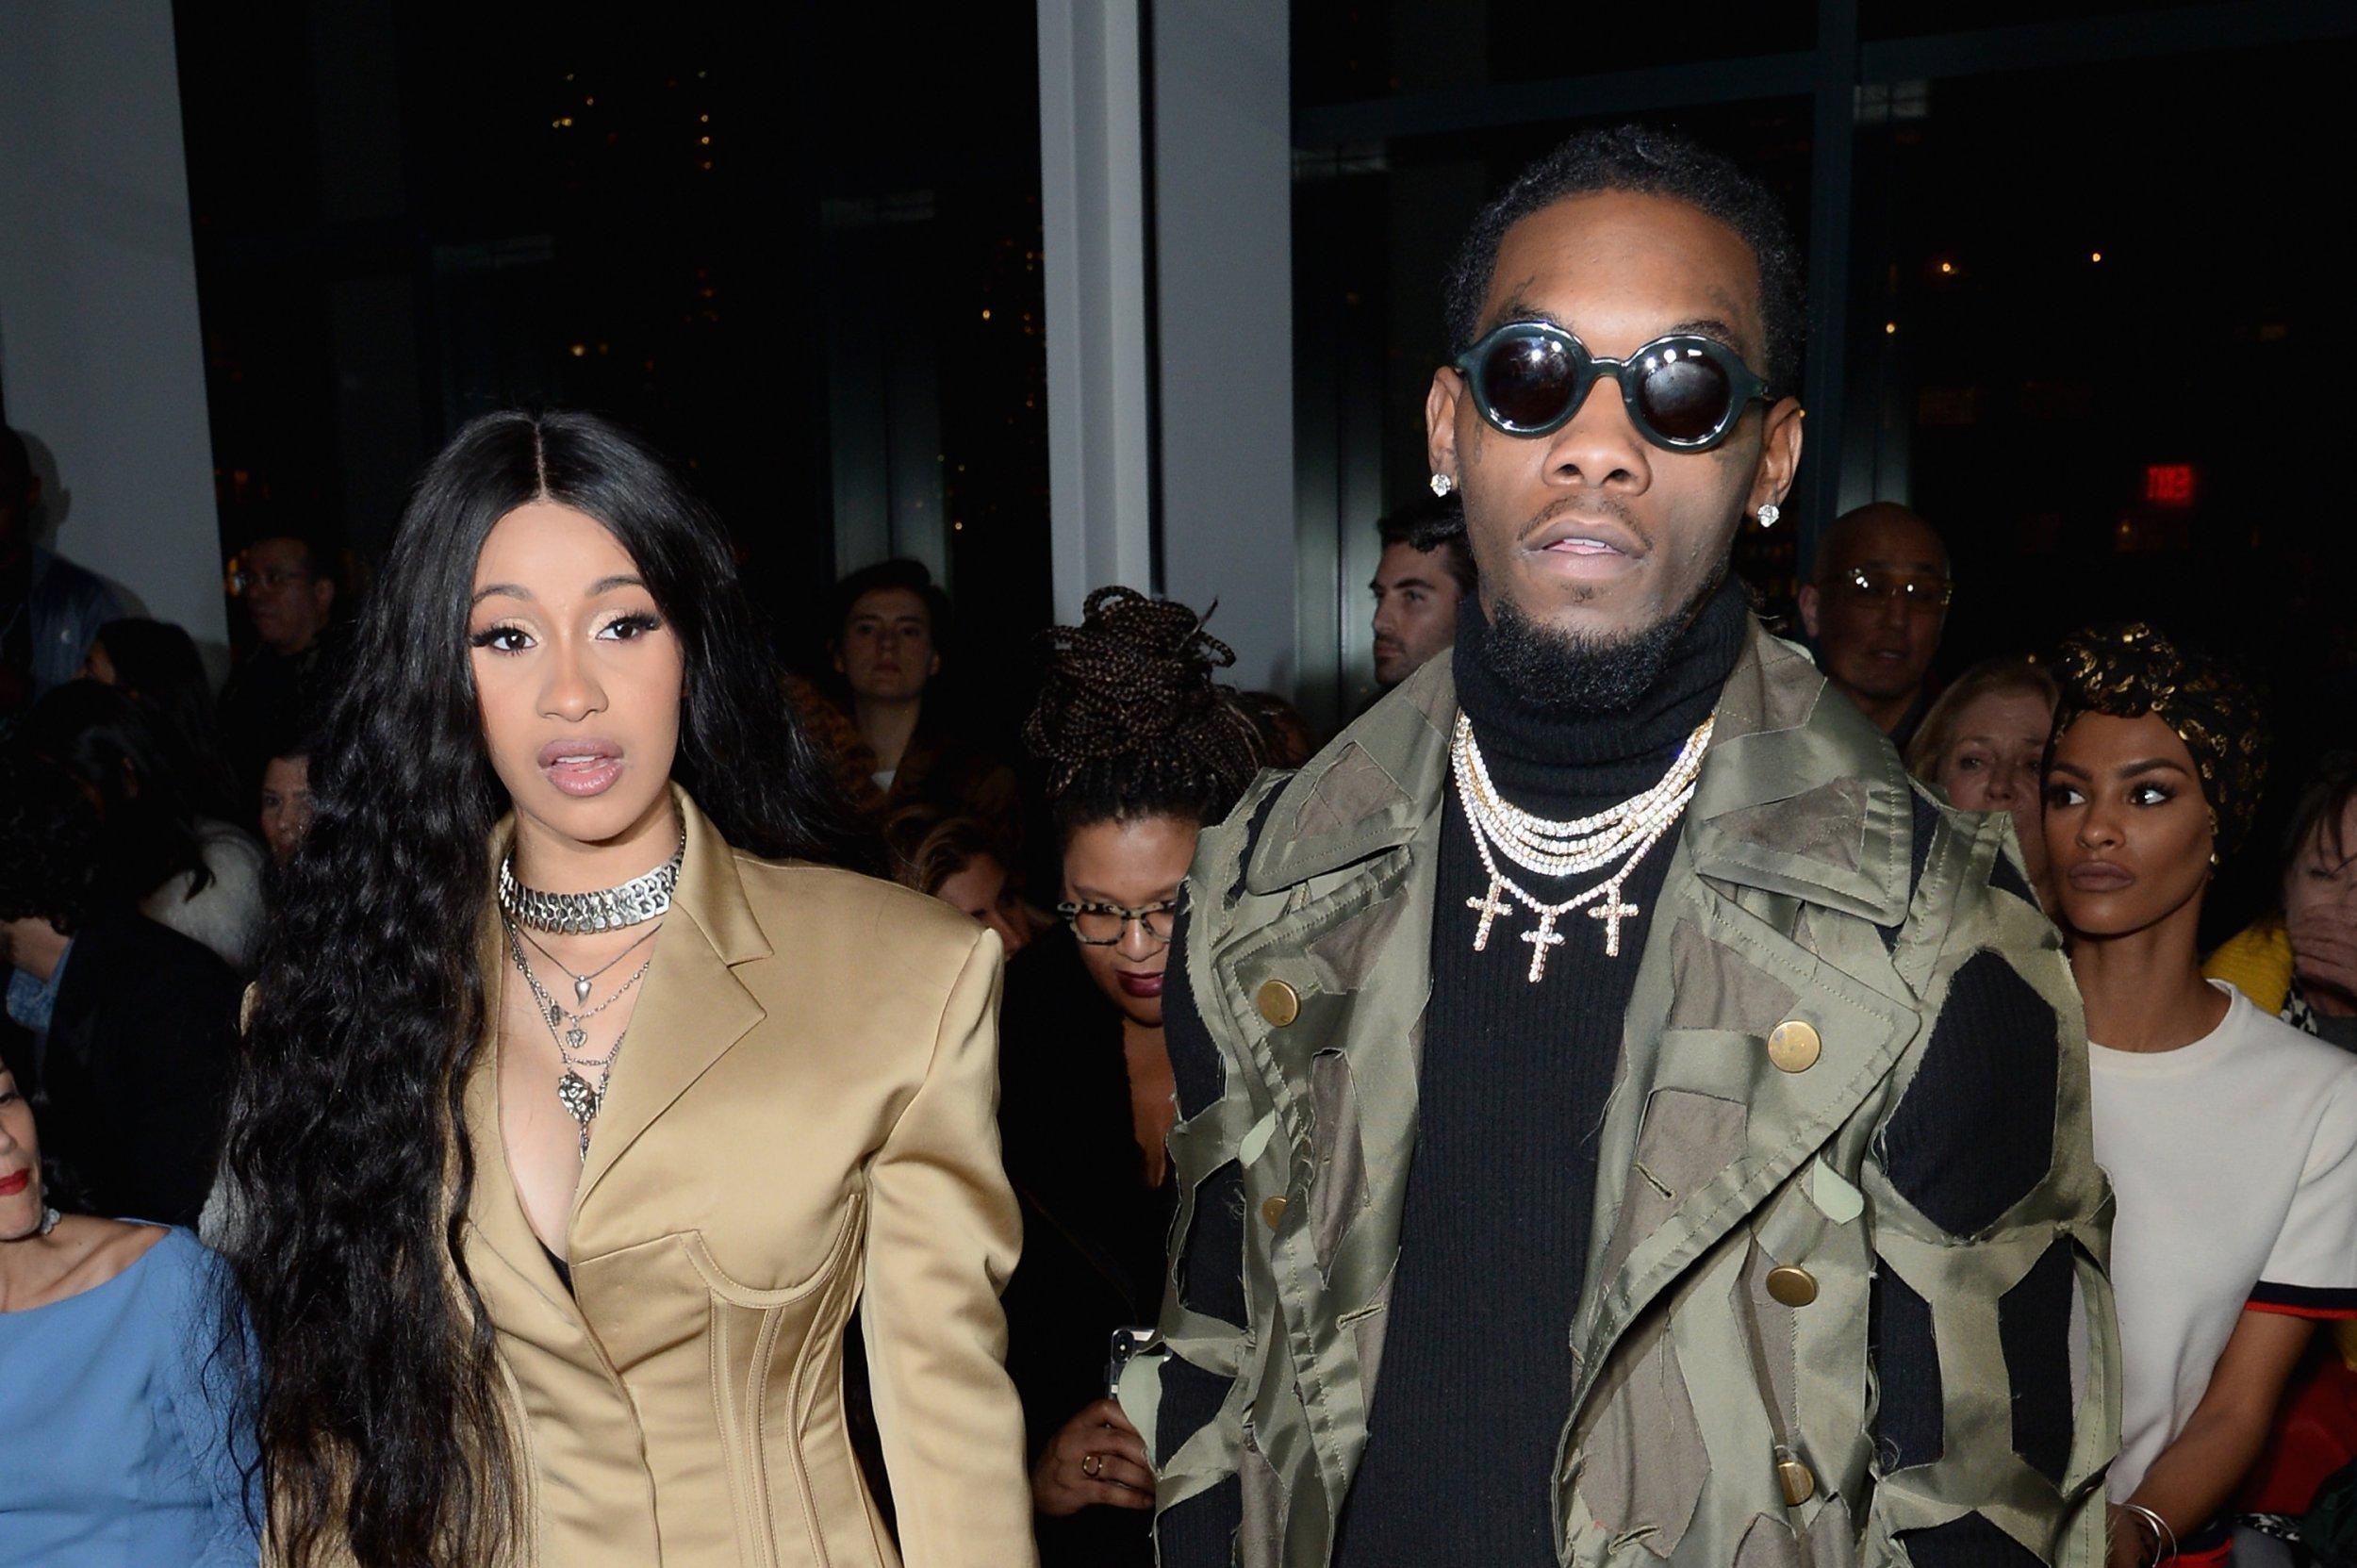 Migos Offset Husband Of Cardi B Arrested On Felony Gun: WATCH: Cardi B, Offset Divorce?: Rapper Announces Split